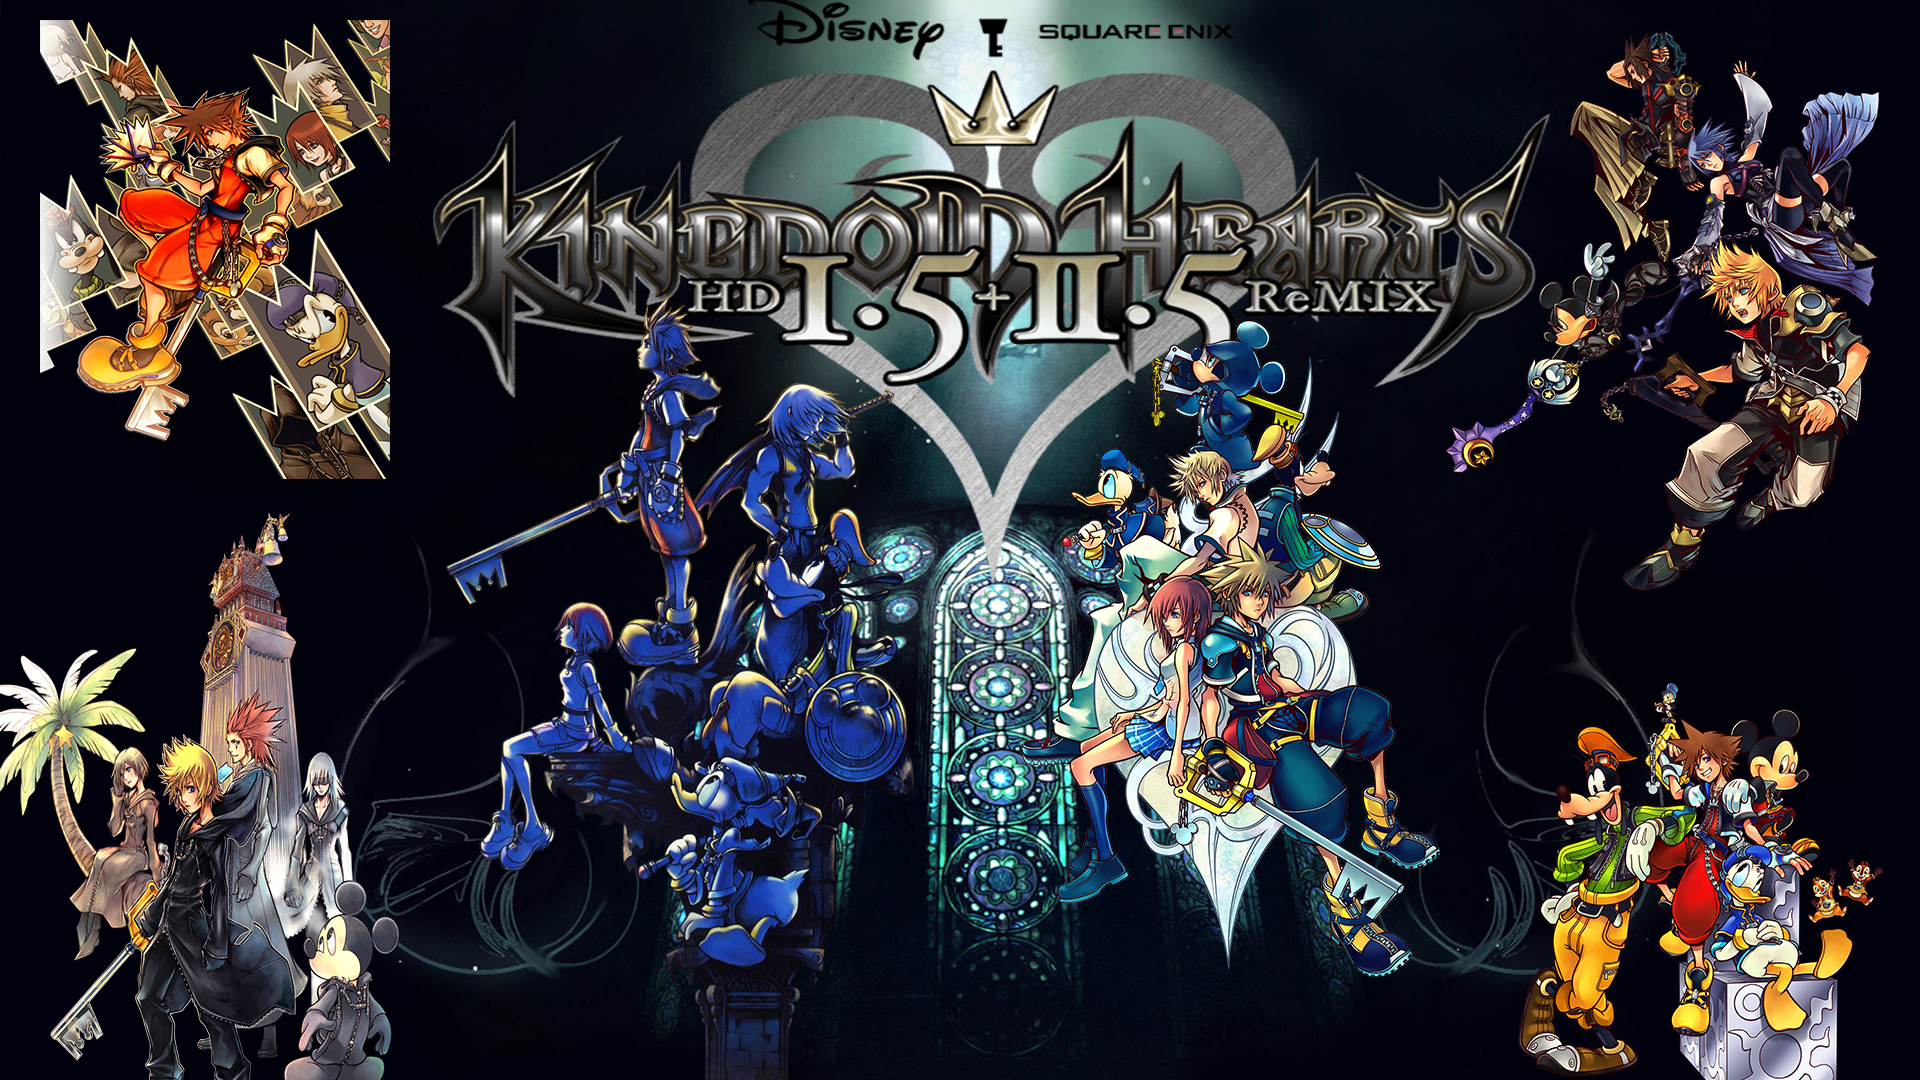 Kingdom Hearts 1 5 2 5 Hd Remix Wallpaper By The Dark Mamba 995